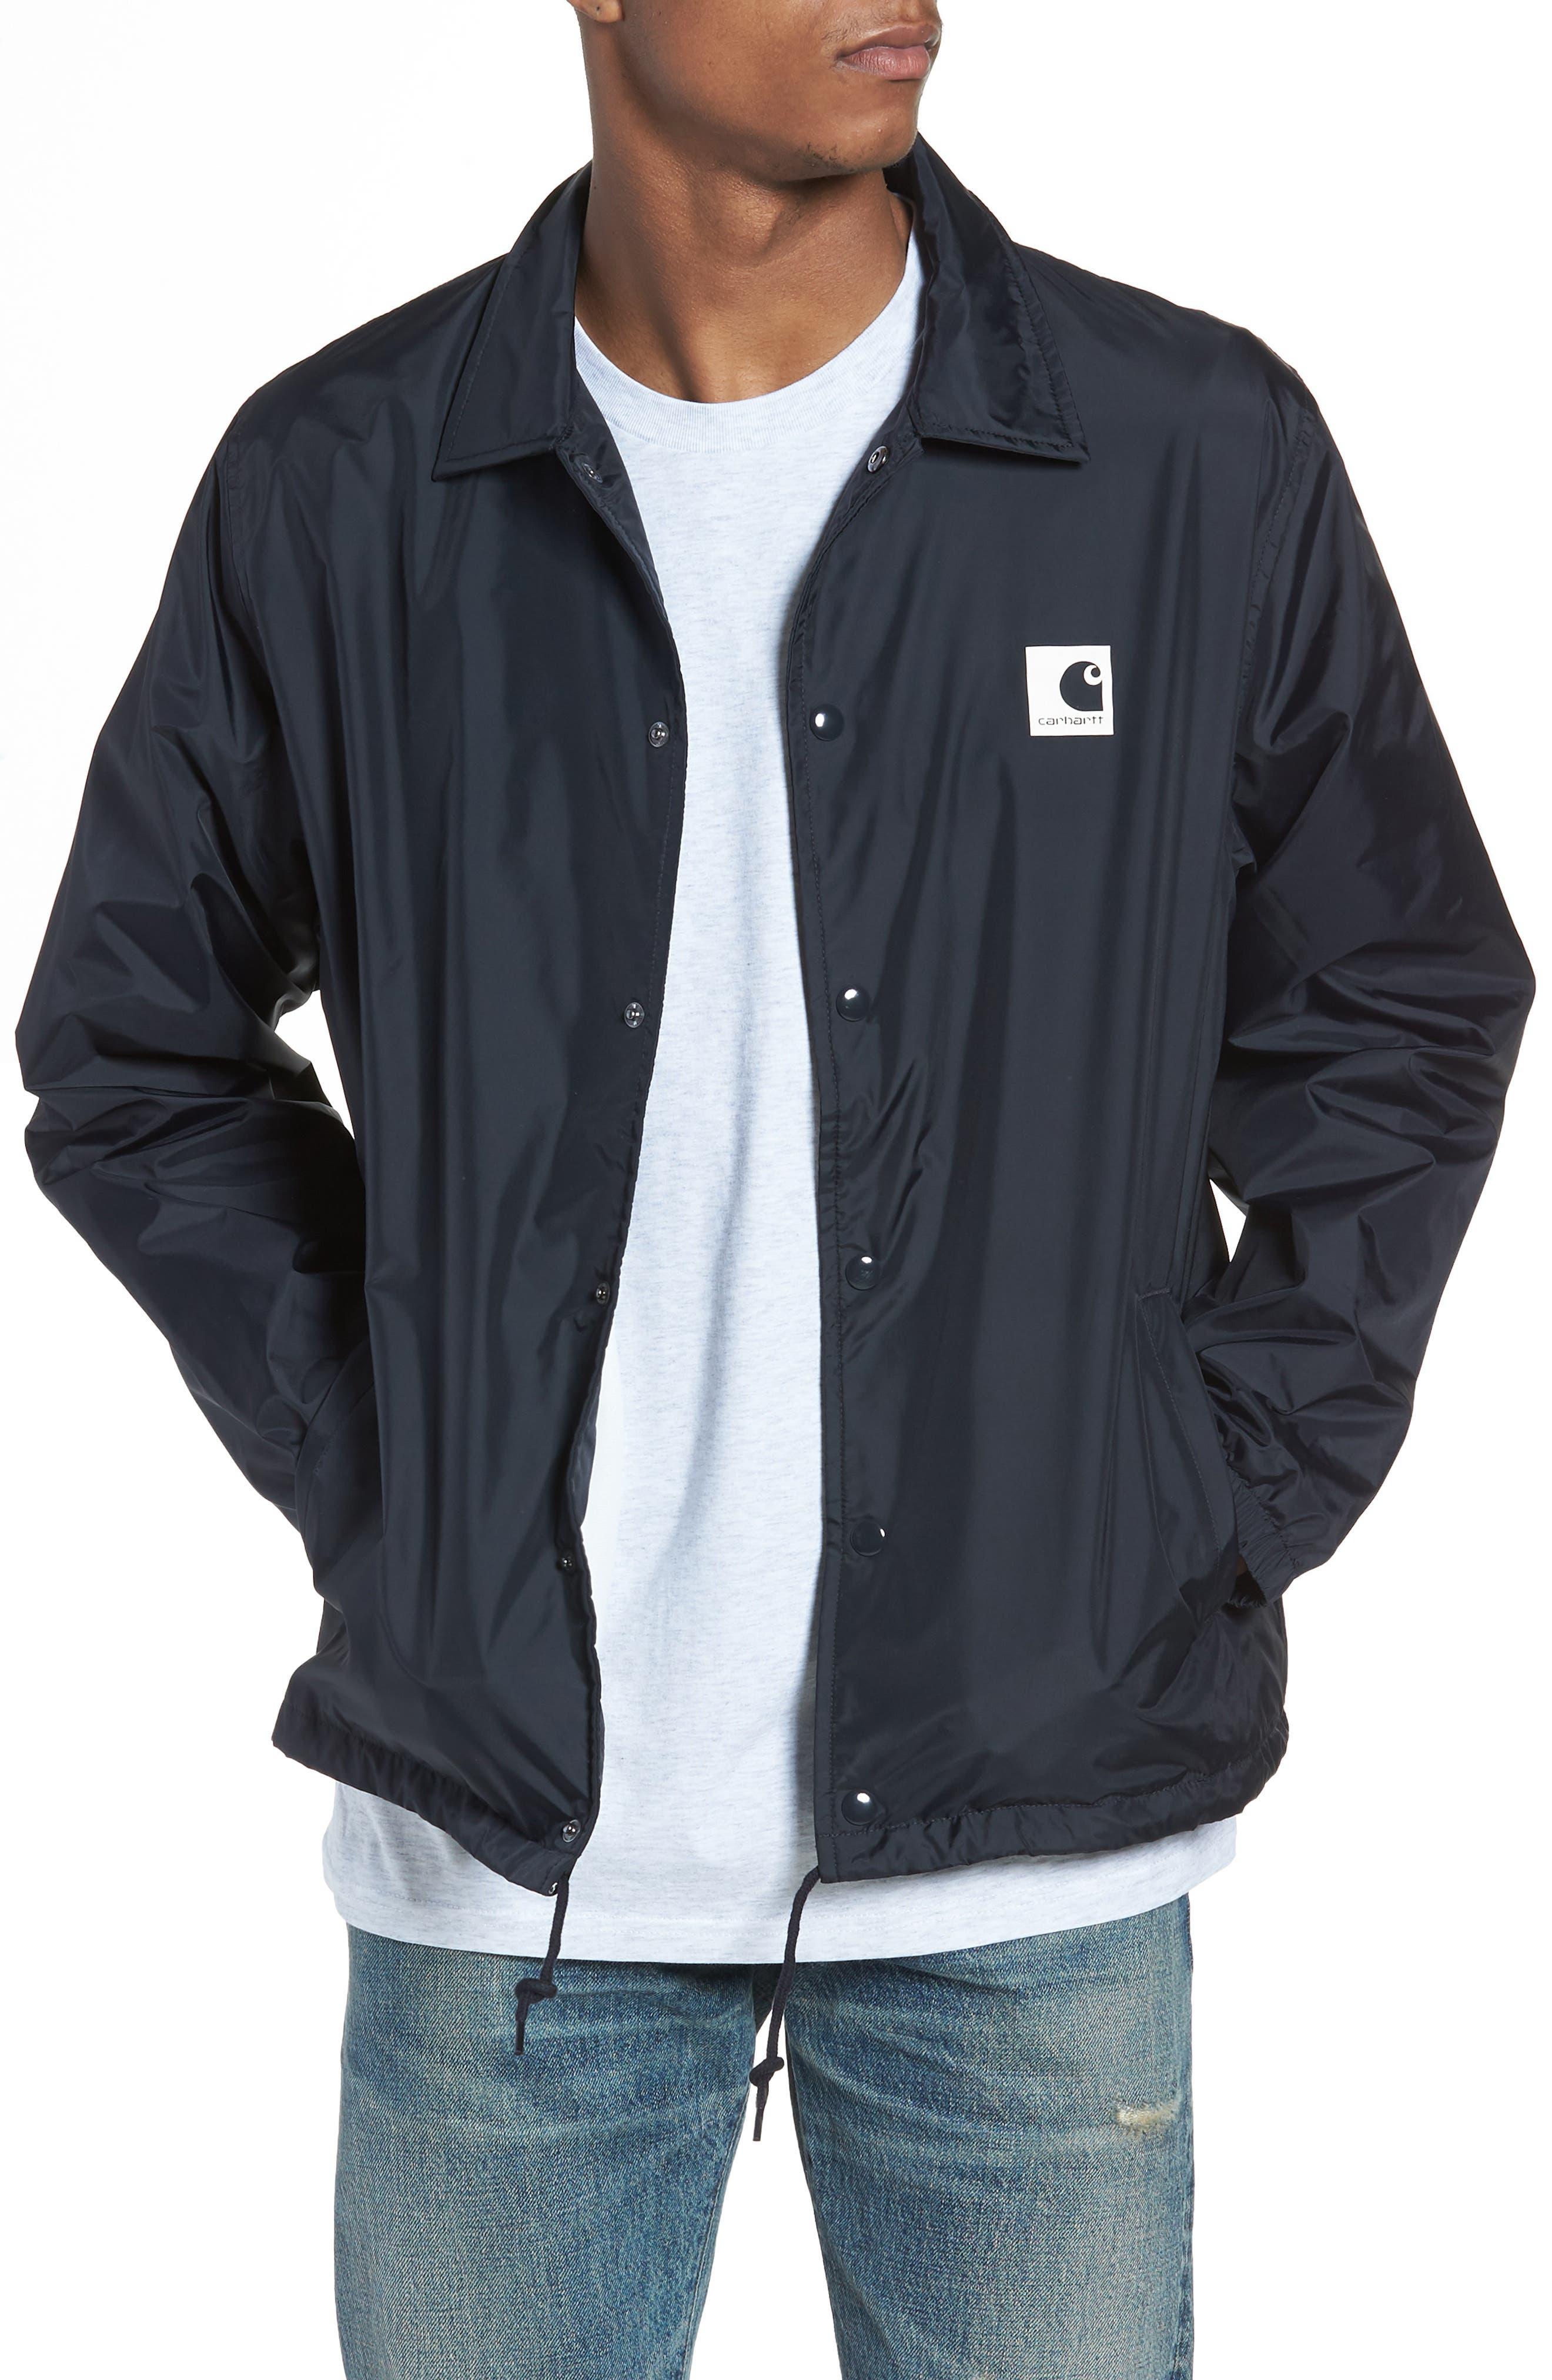 Sport Coach's Jacket,                             Main thumbnail 1, color,                             1C91-Dark Navy/Wax